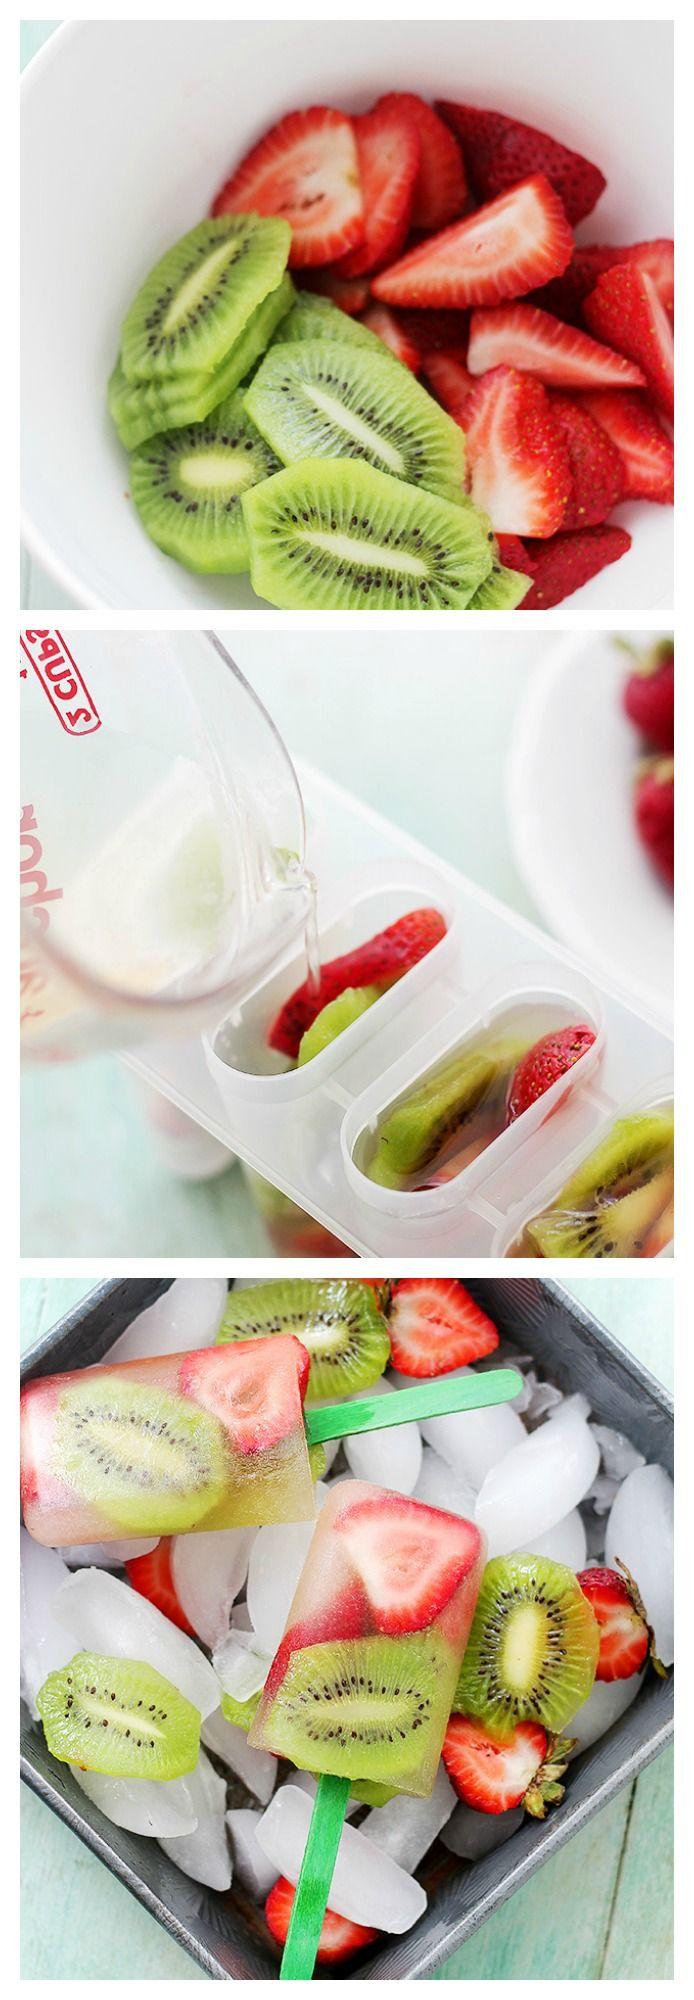 Refrescantes helados de fruta natural.